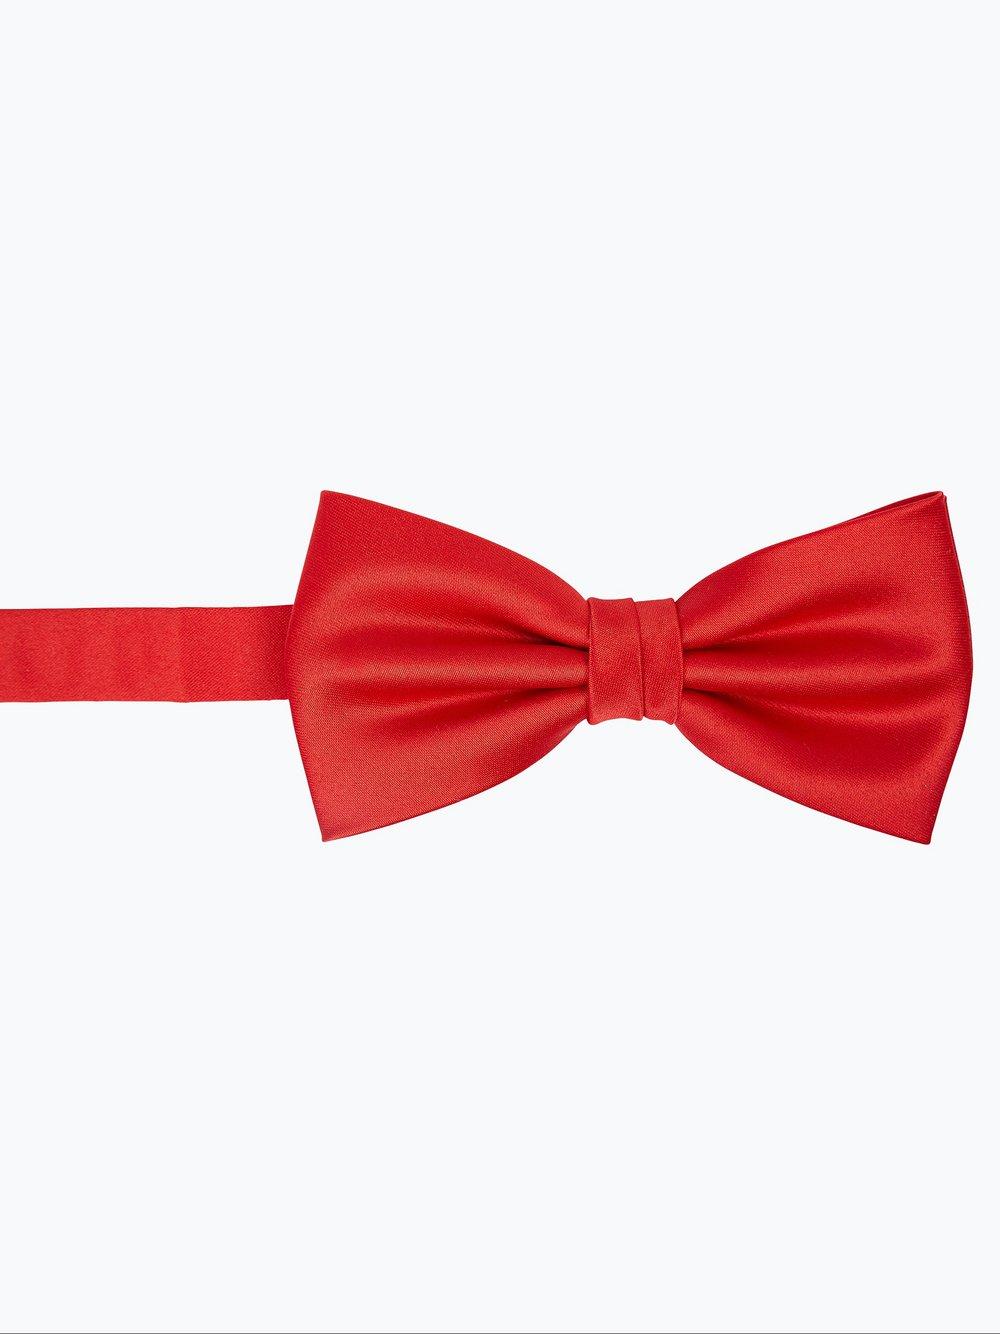 Mc Earl – Muszka i poszetka męska, czerwony Van Graaf 225015-0001-00000